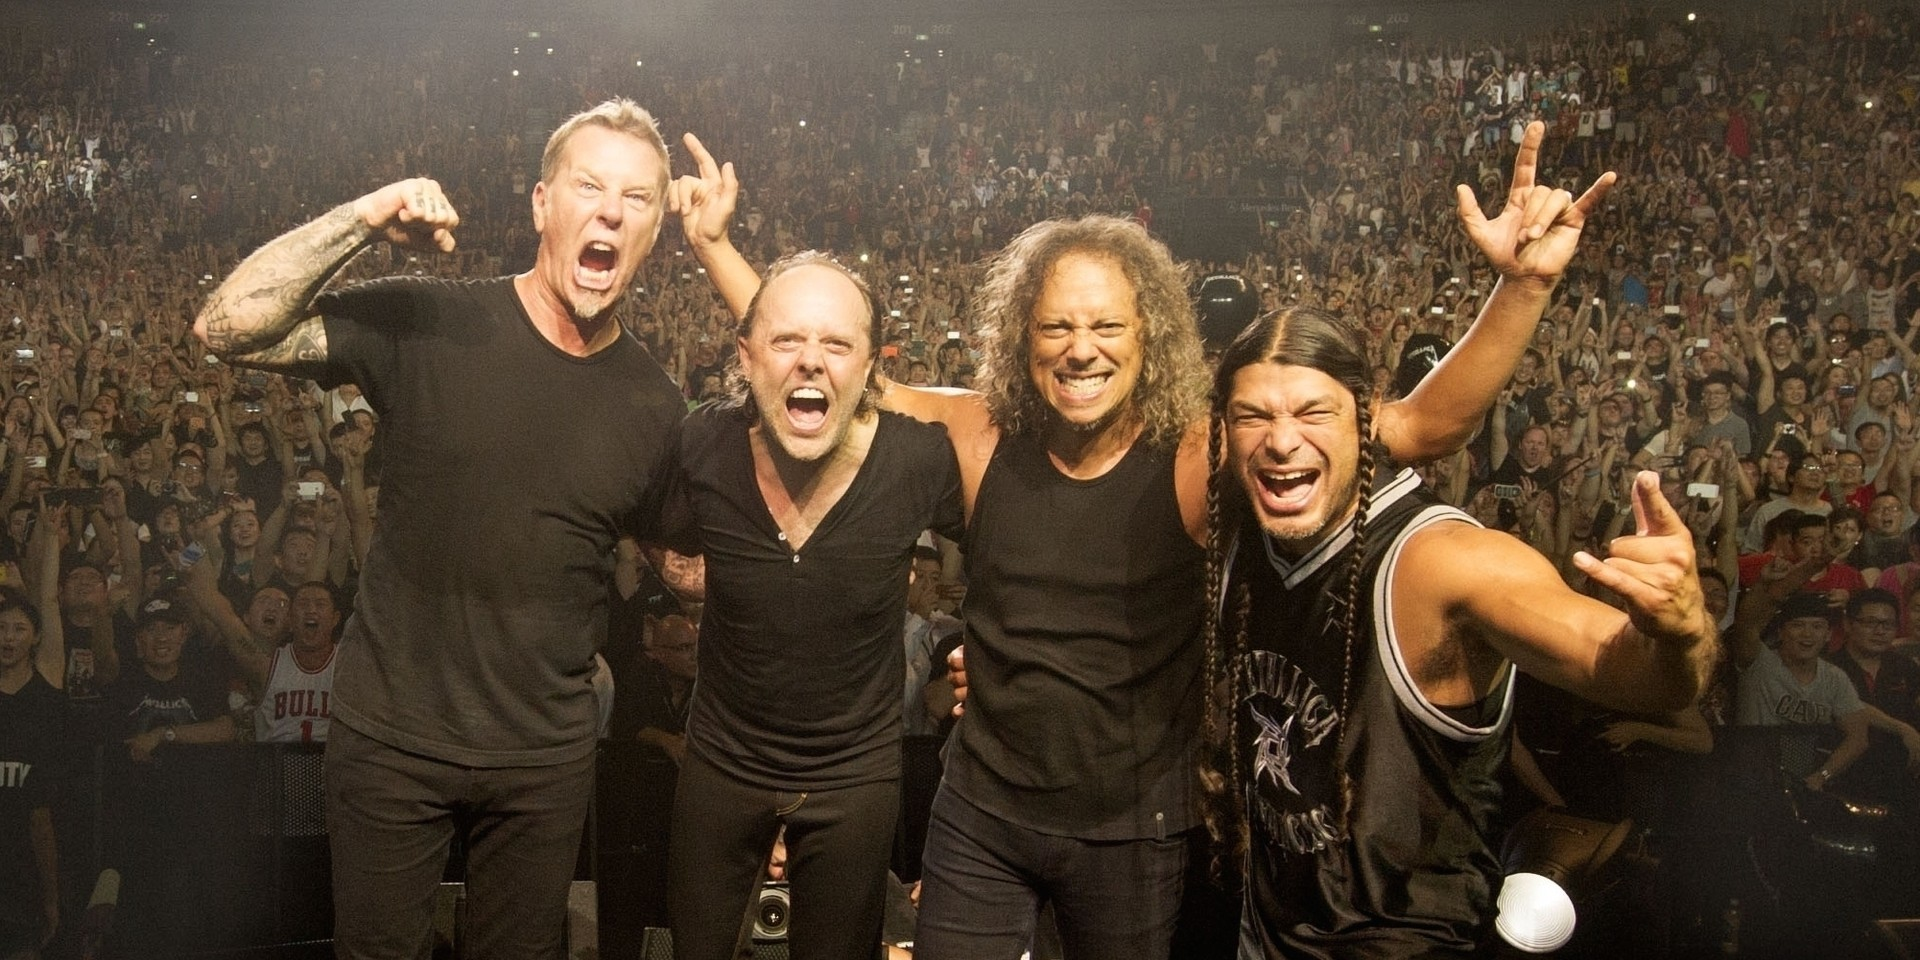 Metallica will begin their 2017 world tour in Asia